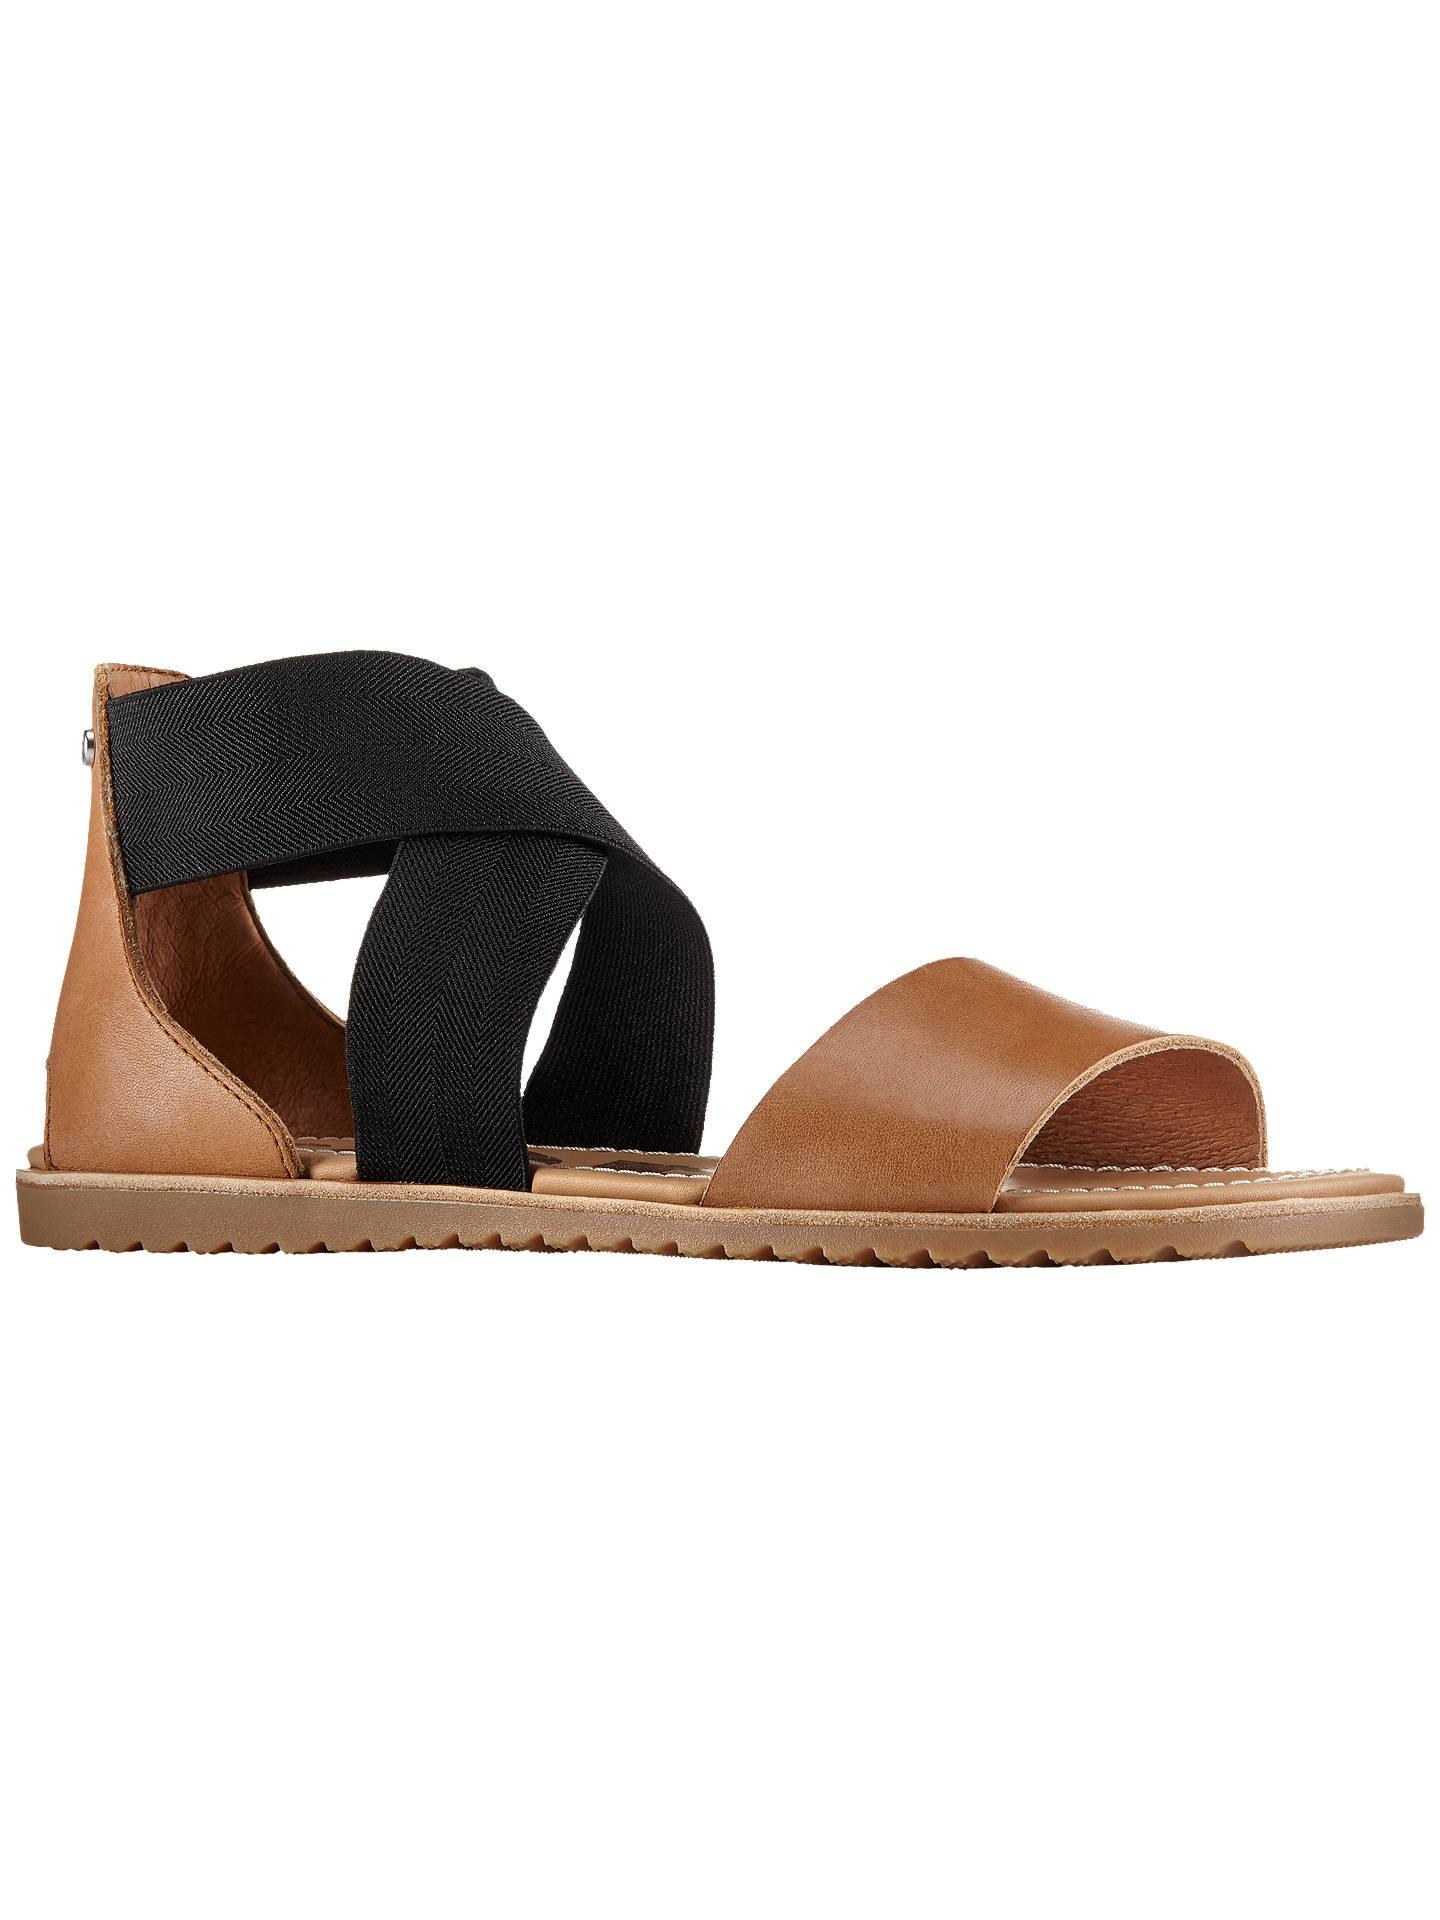 d022ea990 Buy Sorel Ella Cross Strap Women's Sandals, Camel, 8 Online at johnlewis.  ...